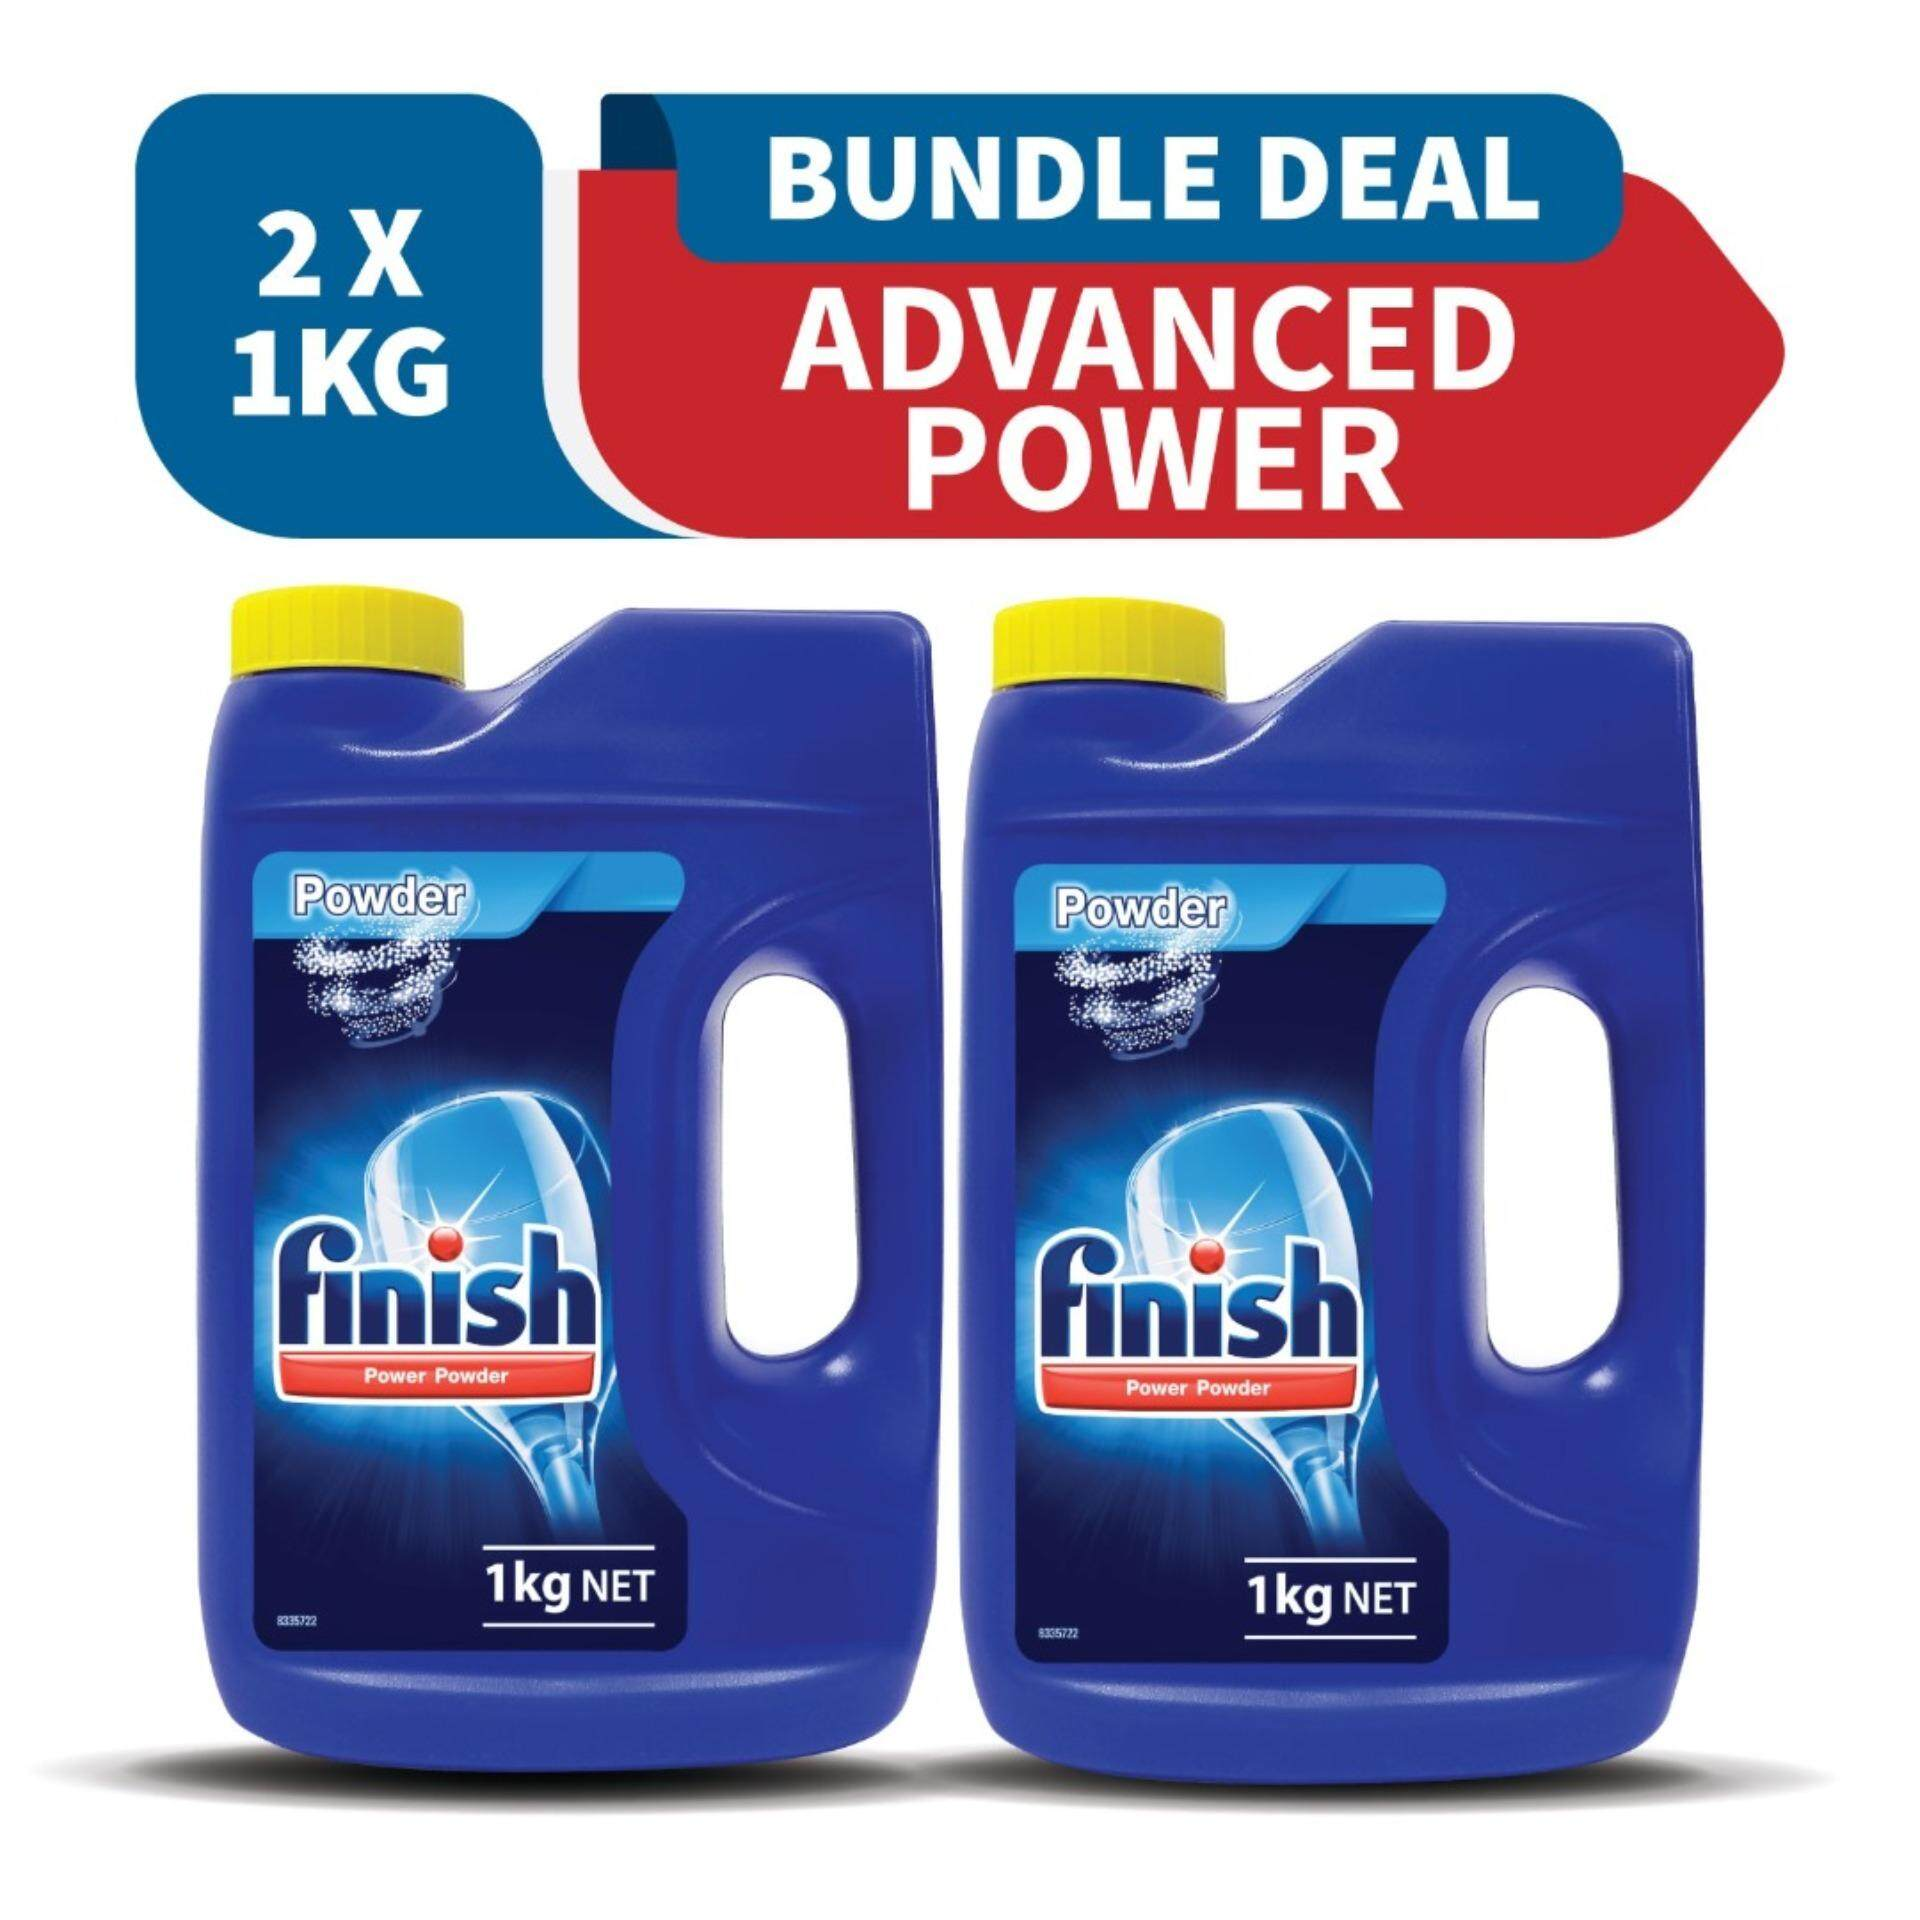 [12.12 MEGA OFFER] Bundle - Finish Dishwasher Cleaning Lemon Powder 1KG x2